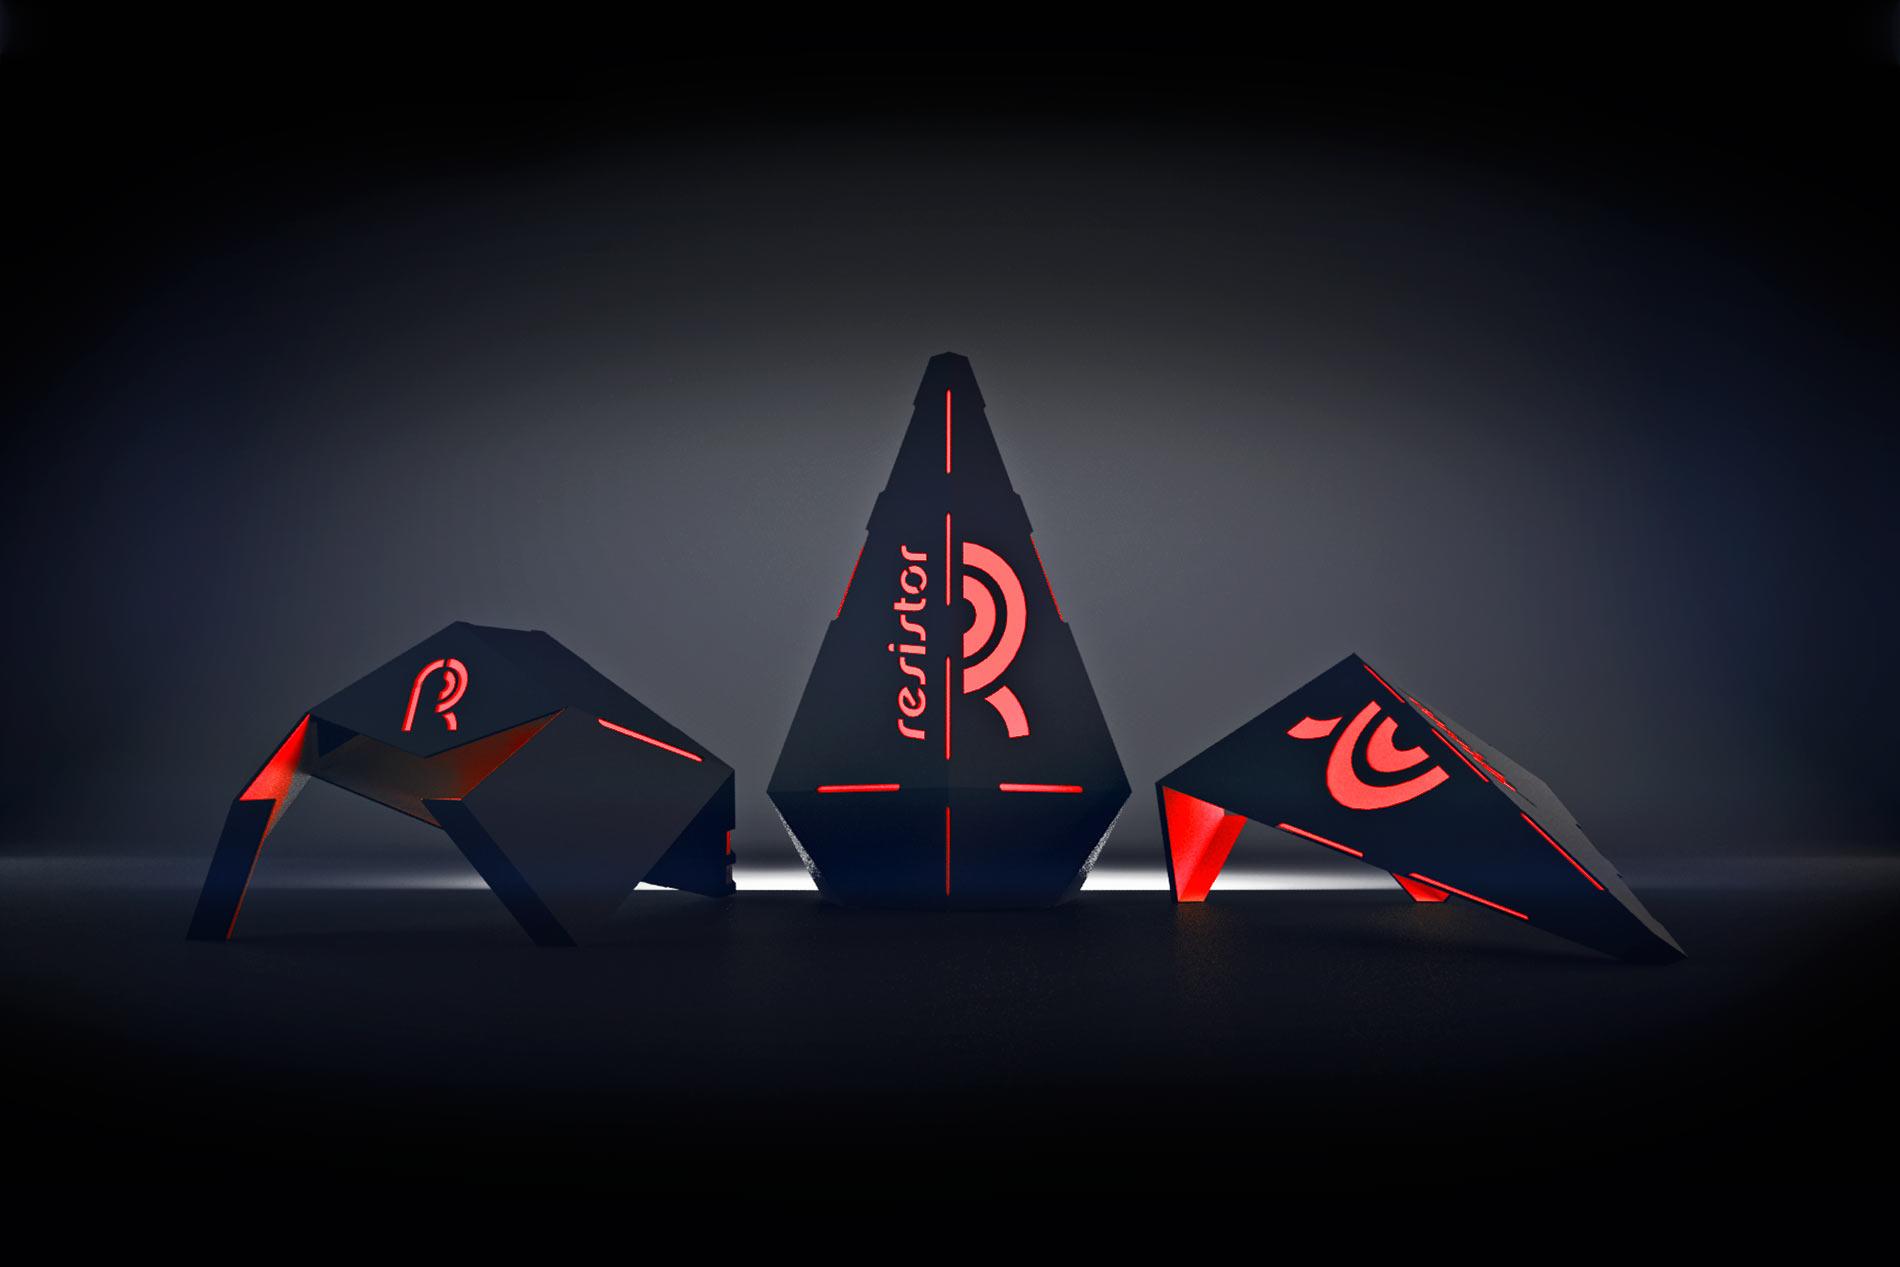 Janina-Lermer-Markenentwickung-Markengestaltung-Branddevelopment-Branddesign-Del-Rosario-Verpackung-Packaging-Quadcopter